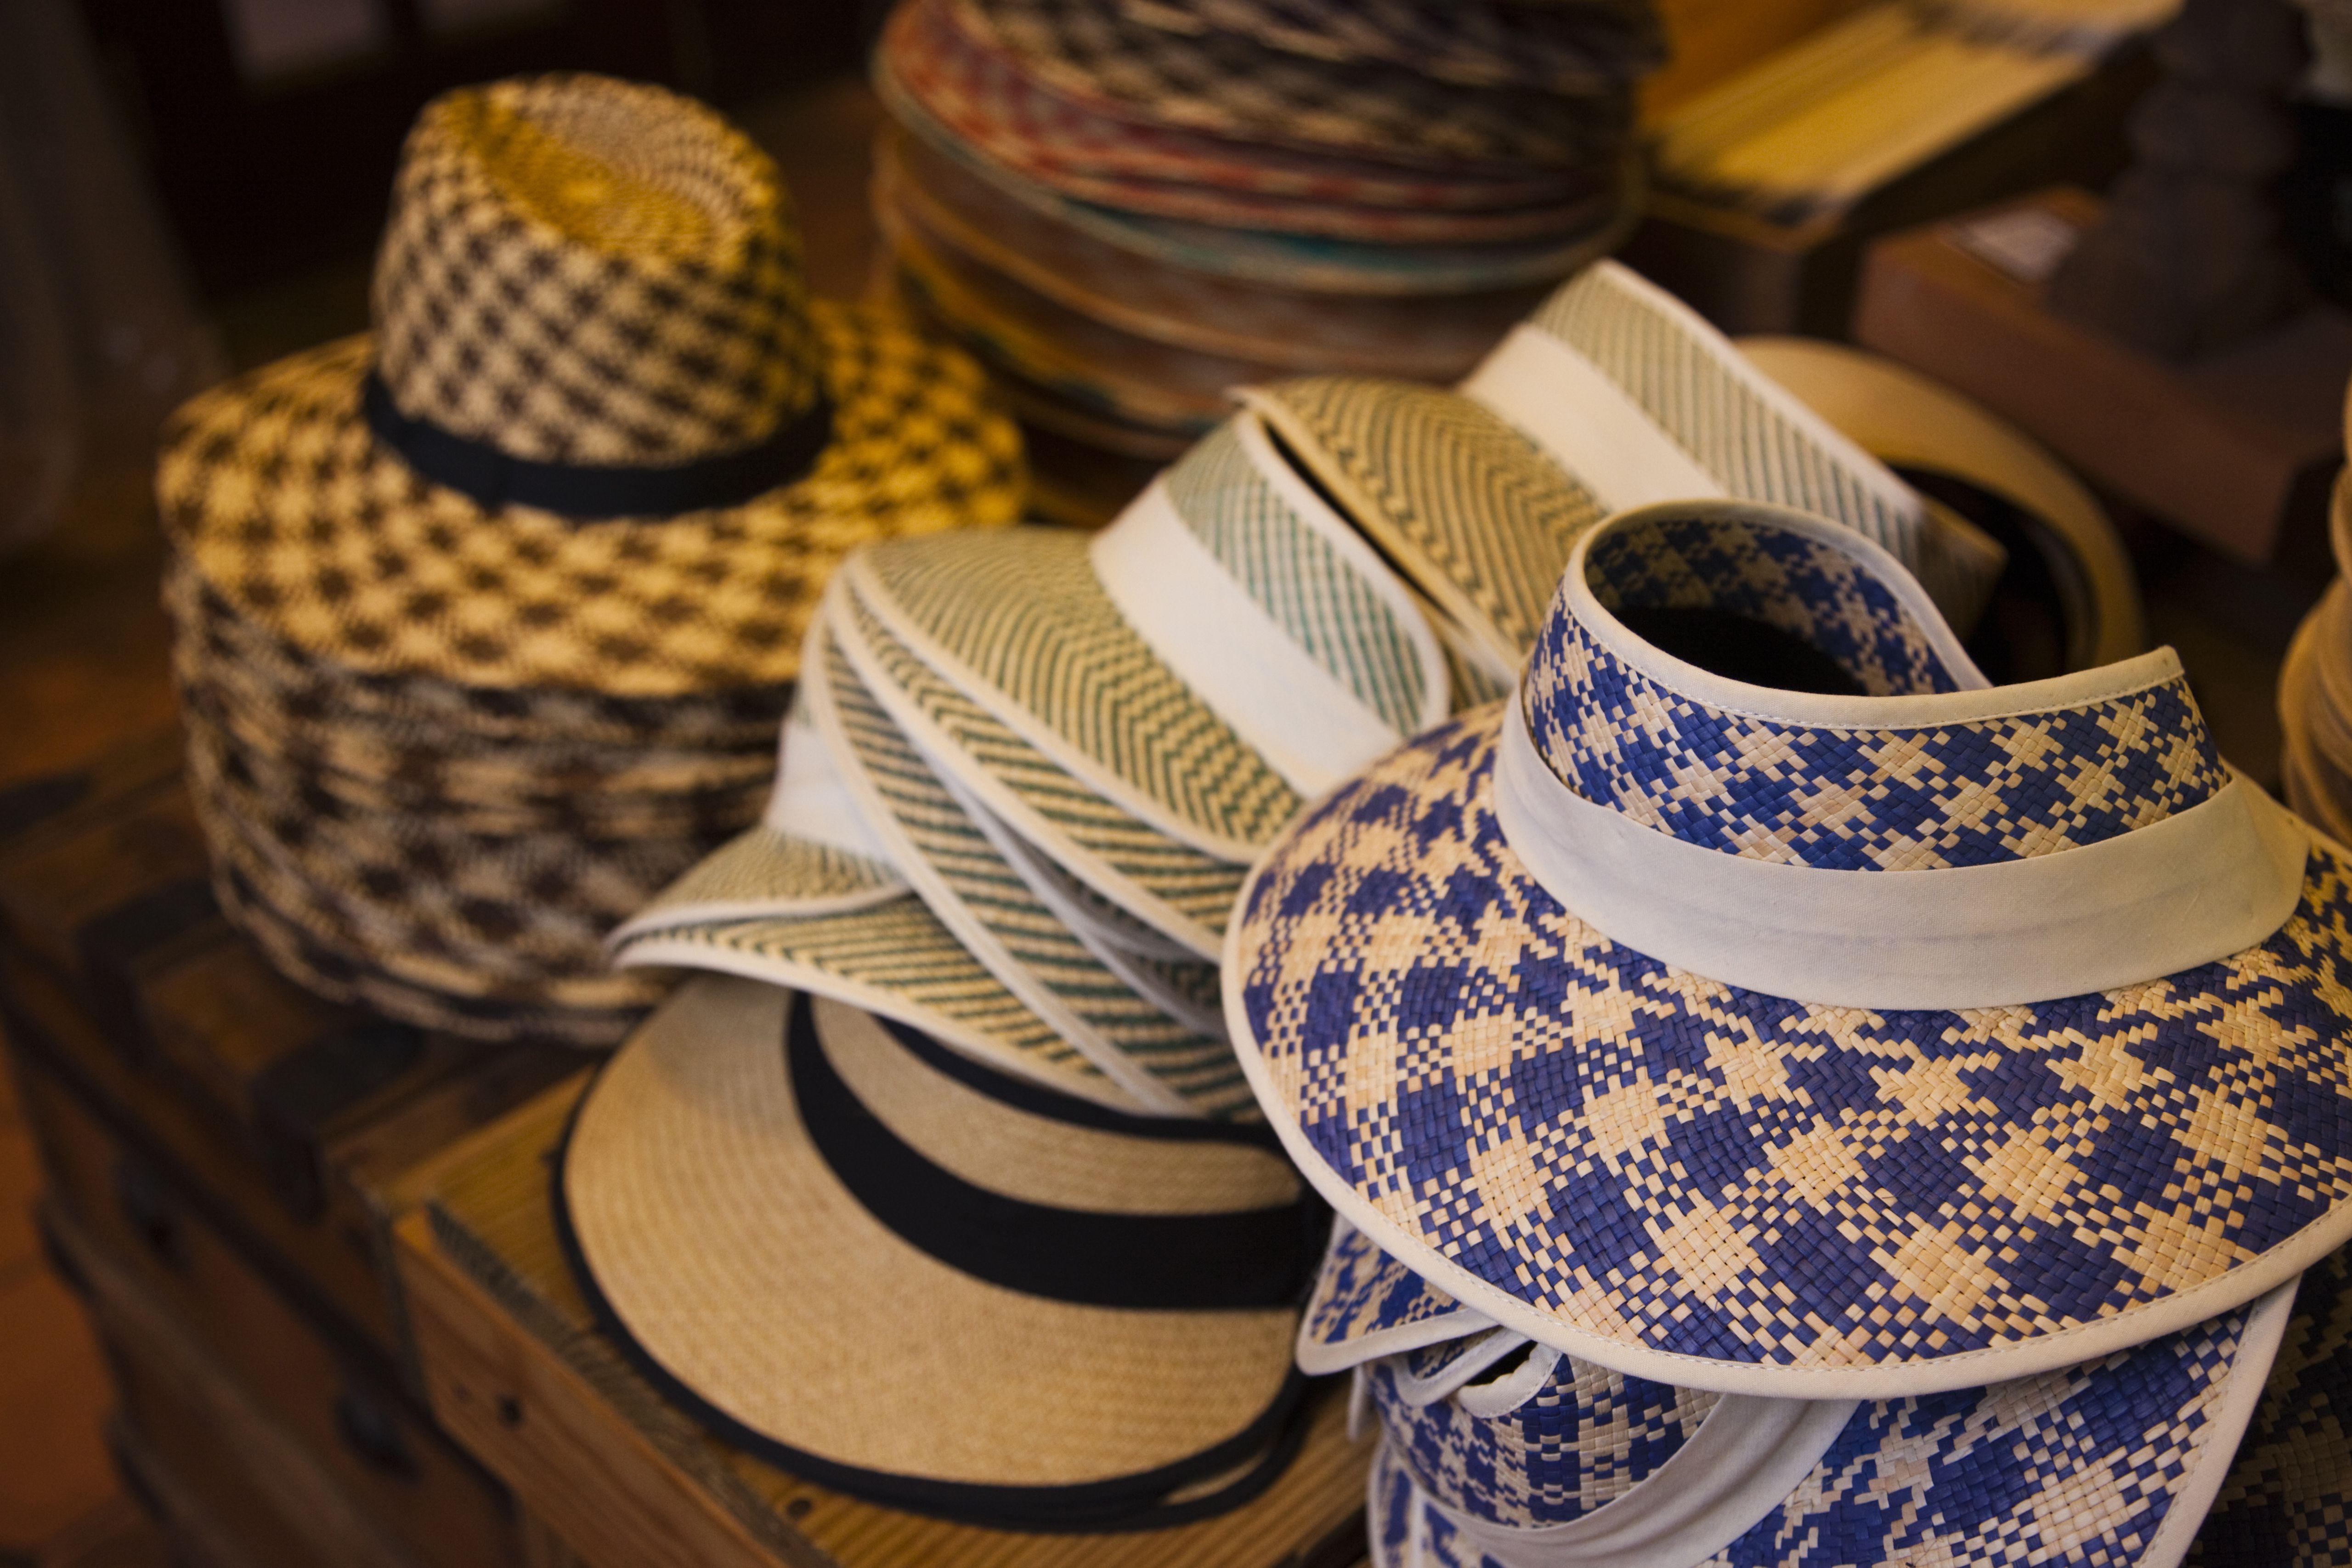 Straw hats for sale, Old San Juan, San Juan, Puerto Rico, December 2009